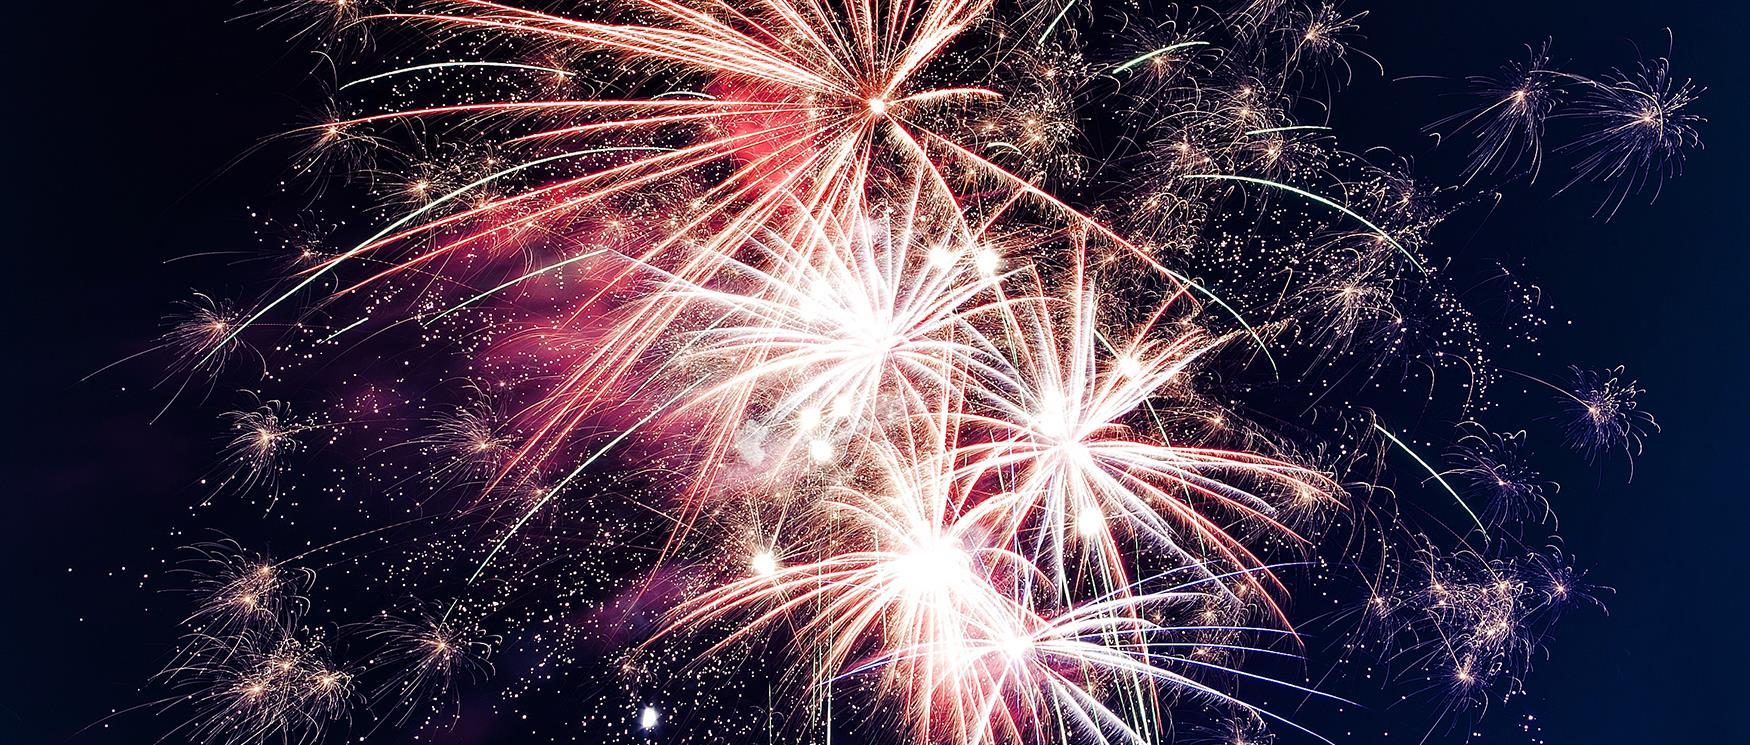 Bonfire Night & Fireworks in Hampshire